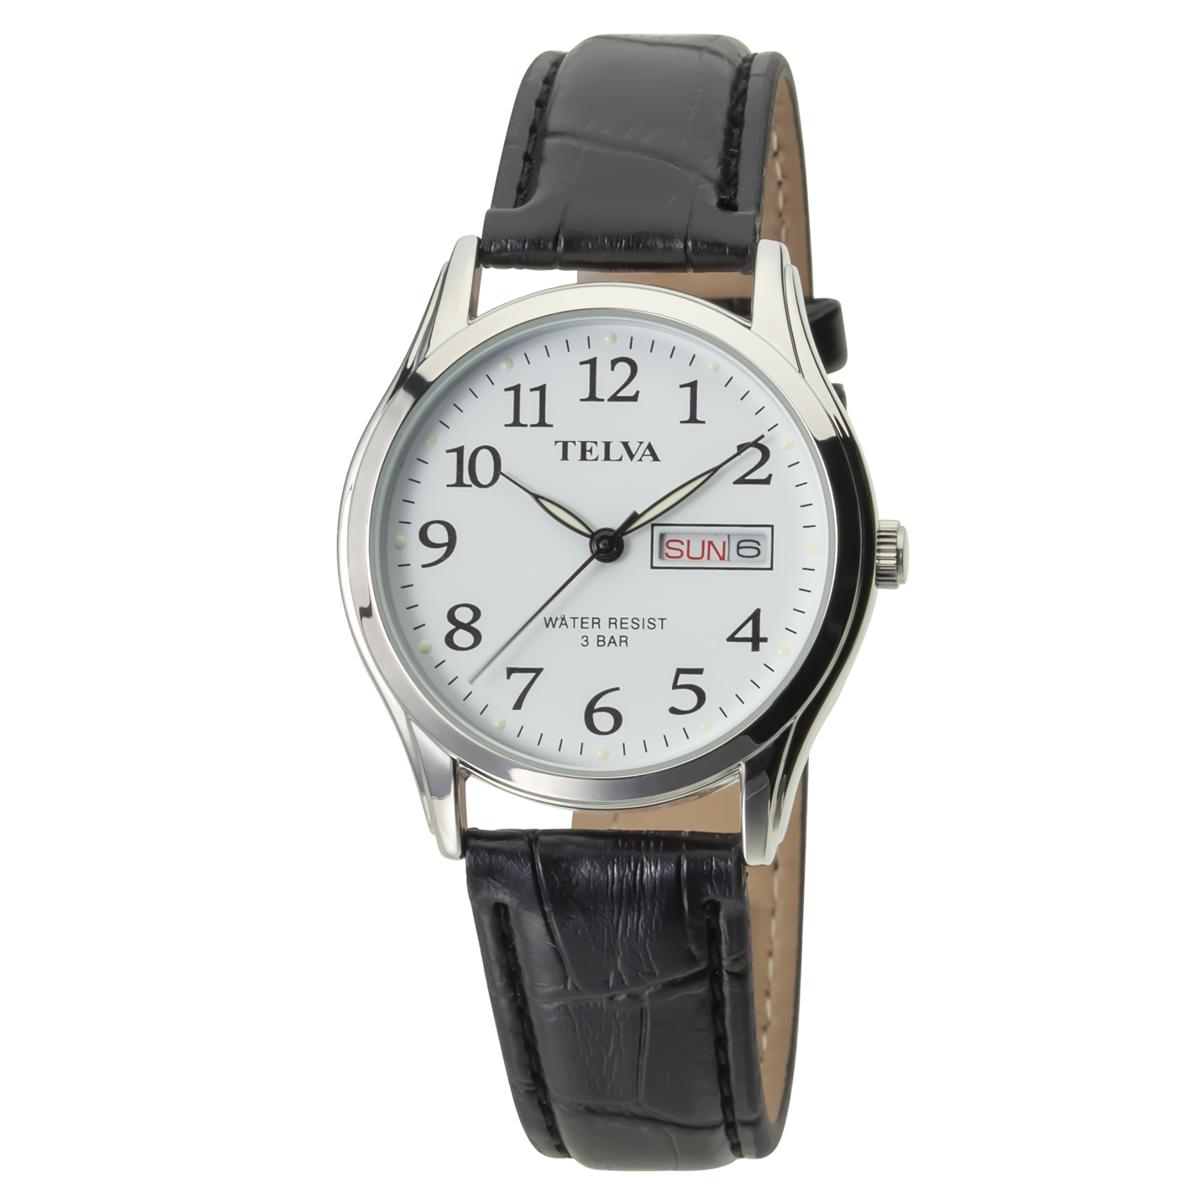 TELVA テルバ アナログウオッチ メンズ 曜日 日付 腕時計【TE-AM176】